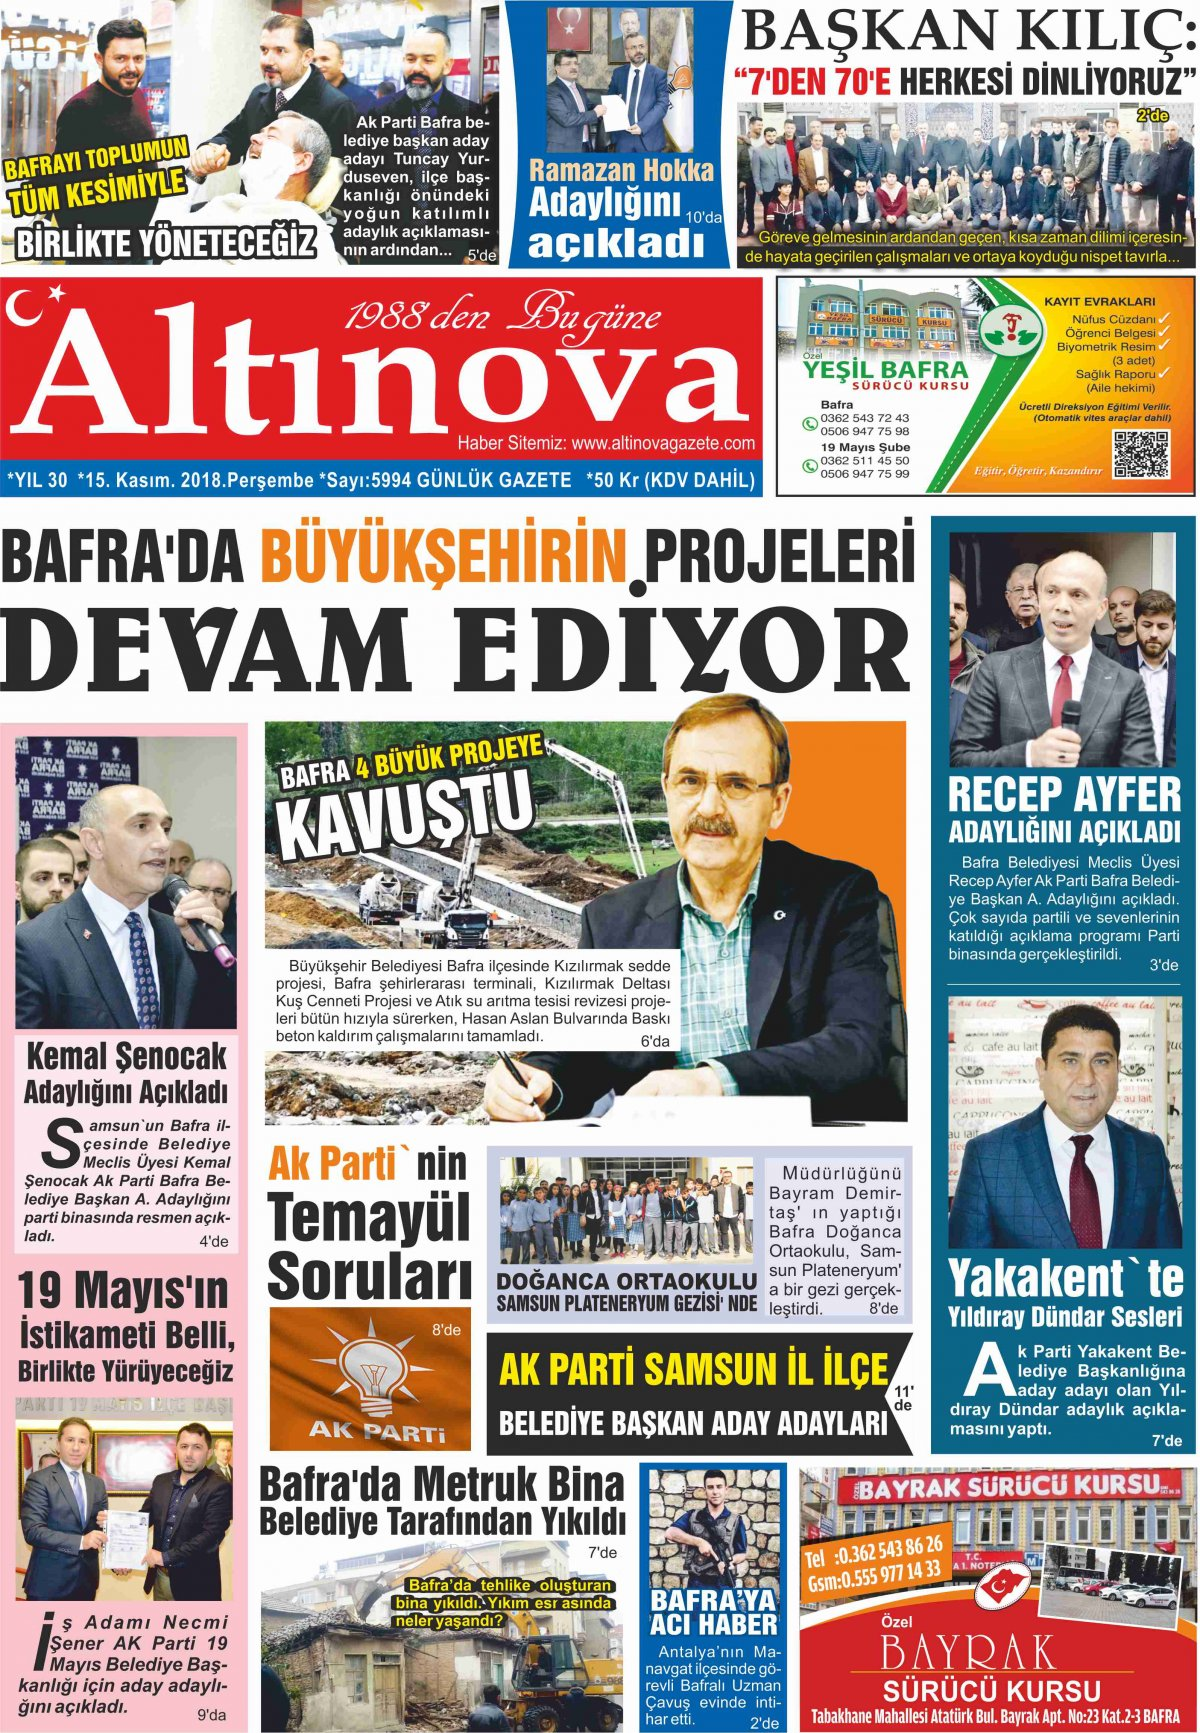 Bafra Haberleri   Bafra Haber – Bafra Son Dakika Haber - 15.11.2018 Manşeti